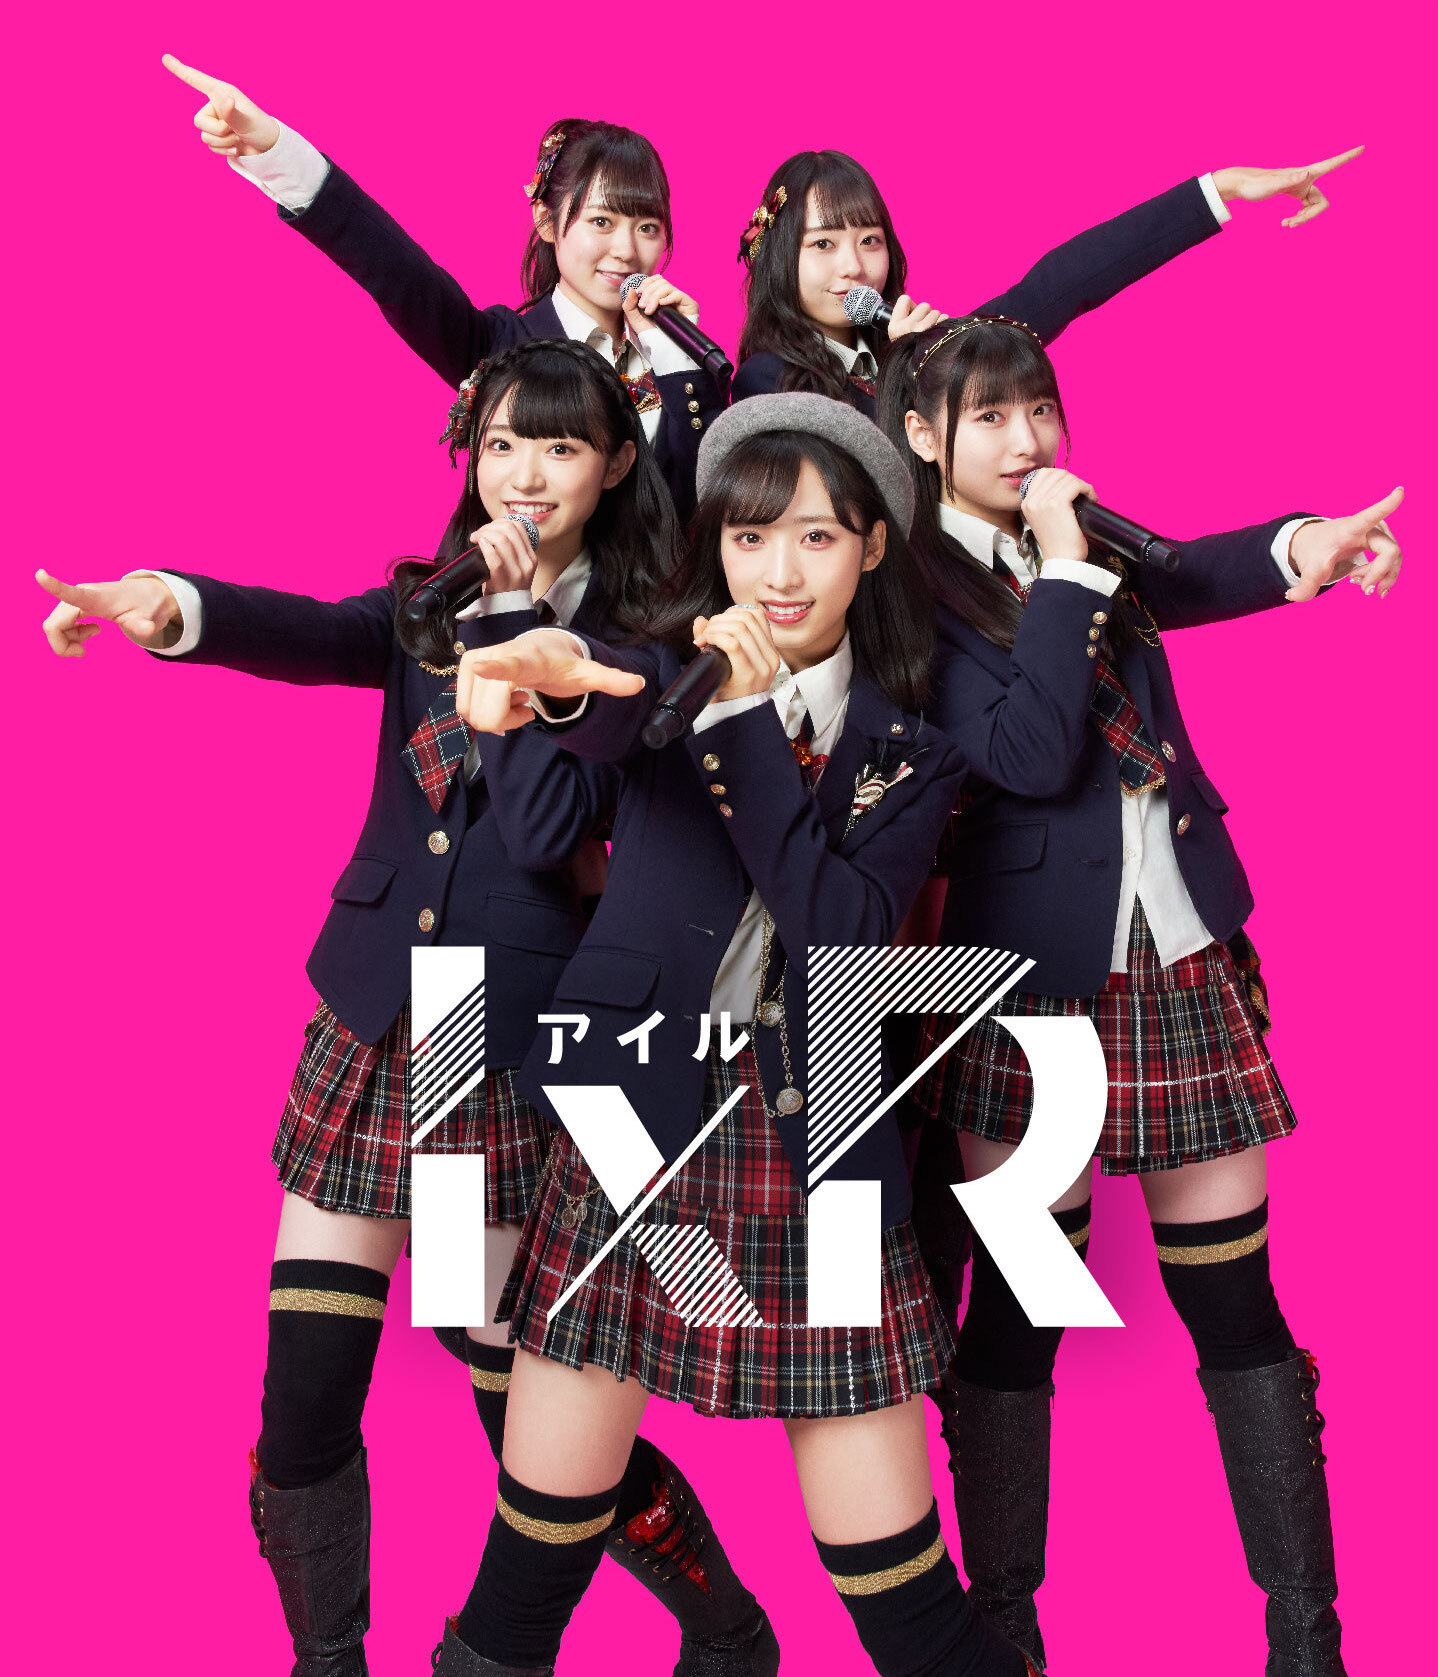 IxR(アイル) from AKB48